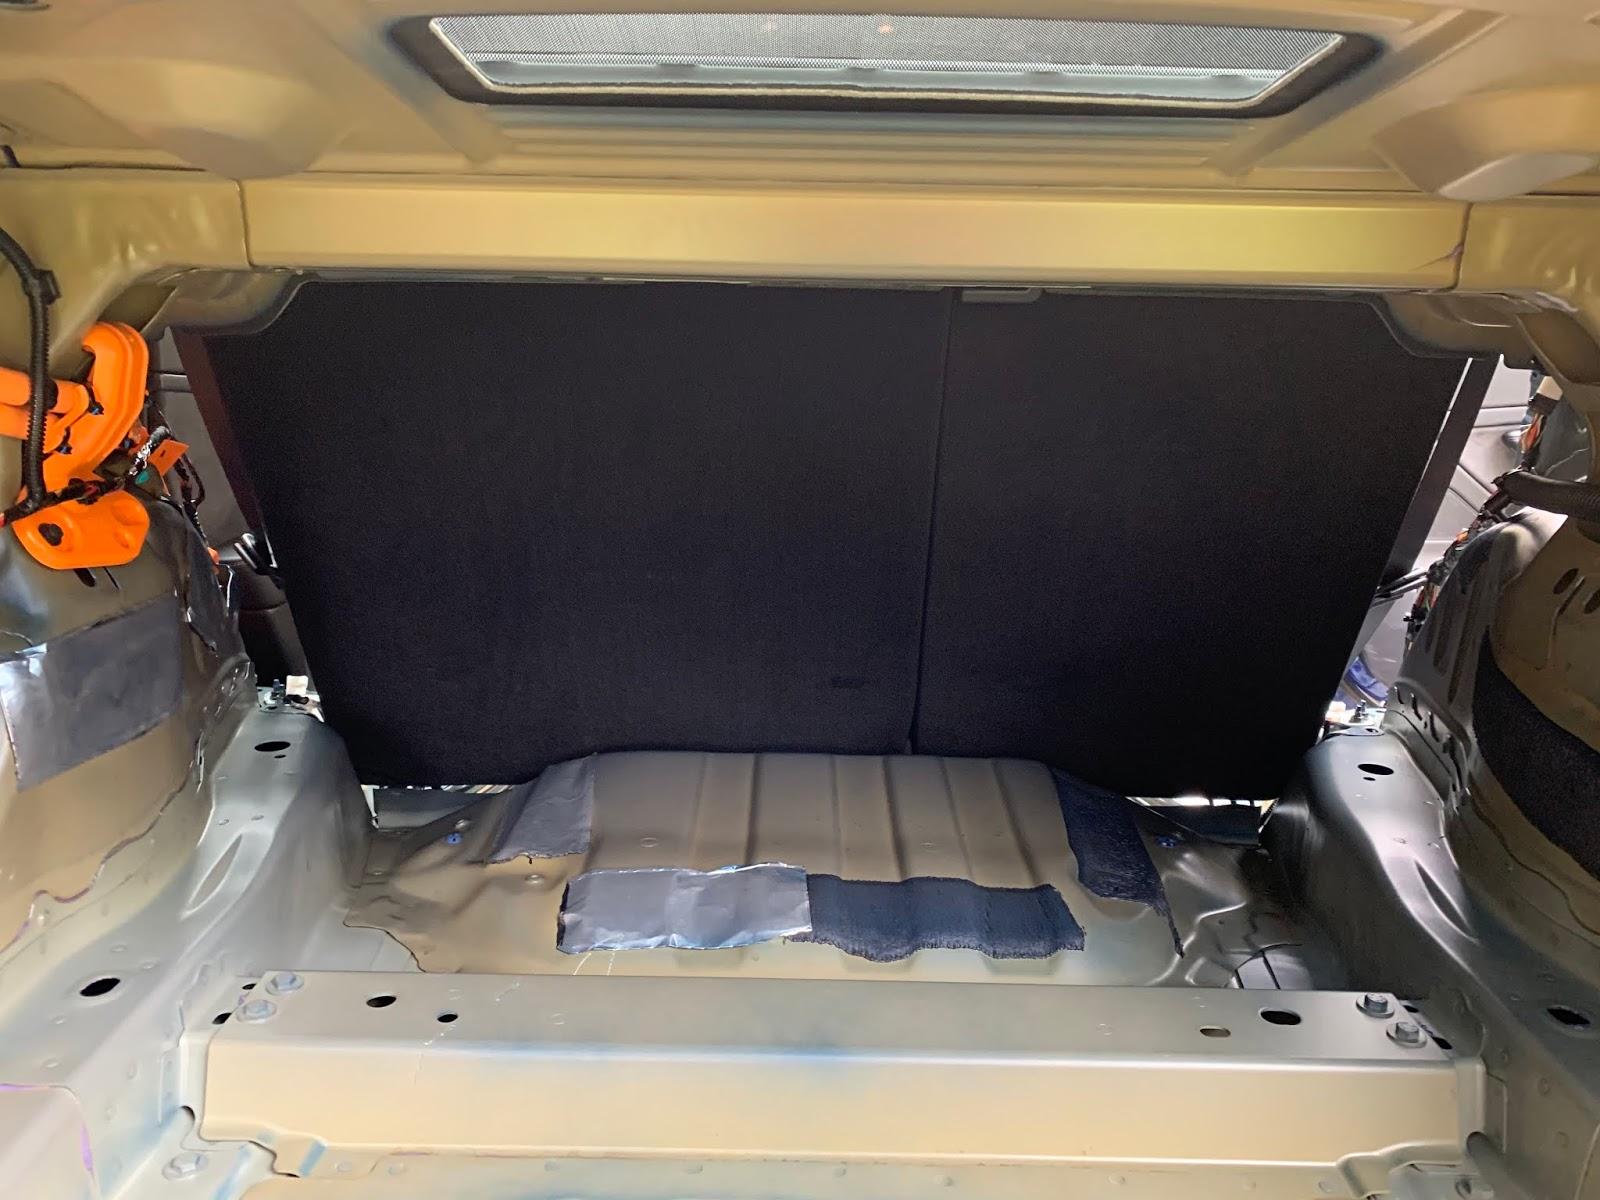 Tesla Model 3 Stereo - Part 3: Trunk Insulation